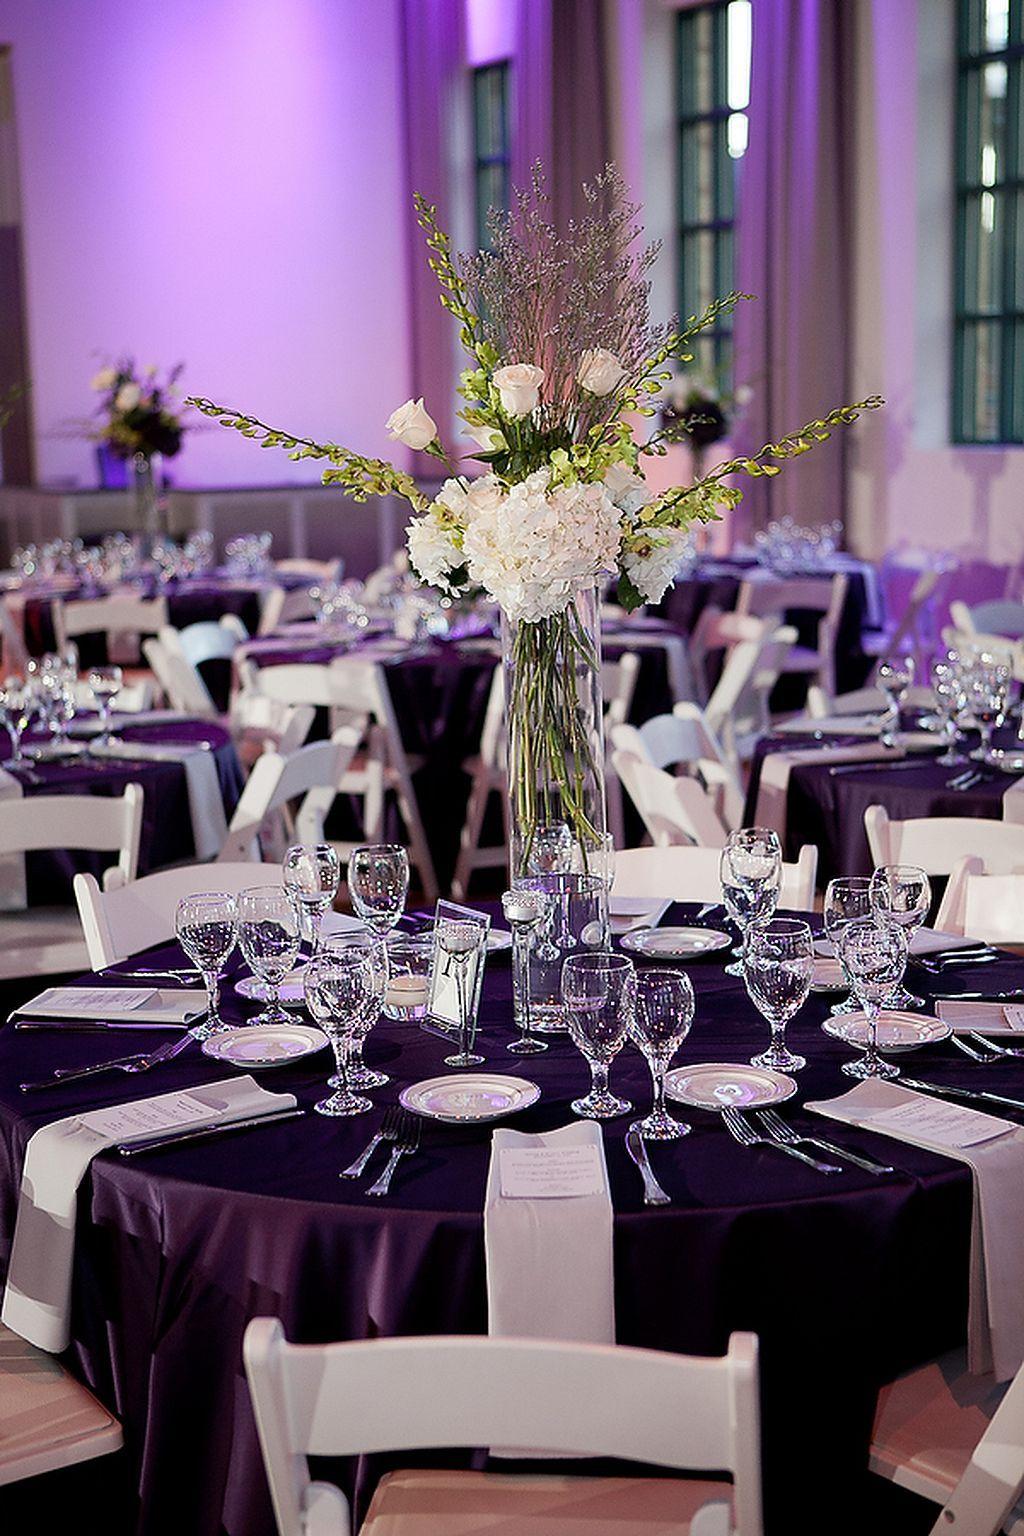 Awesome 50 Perfect Purple Wedding Ideas Https Weddmagz Com 50